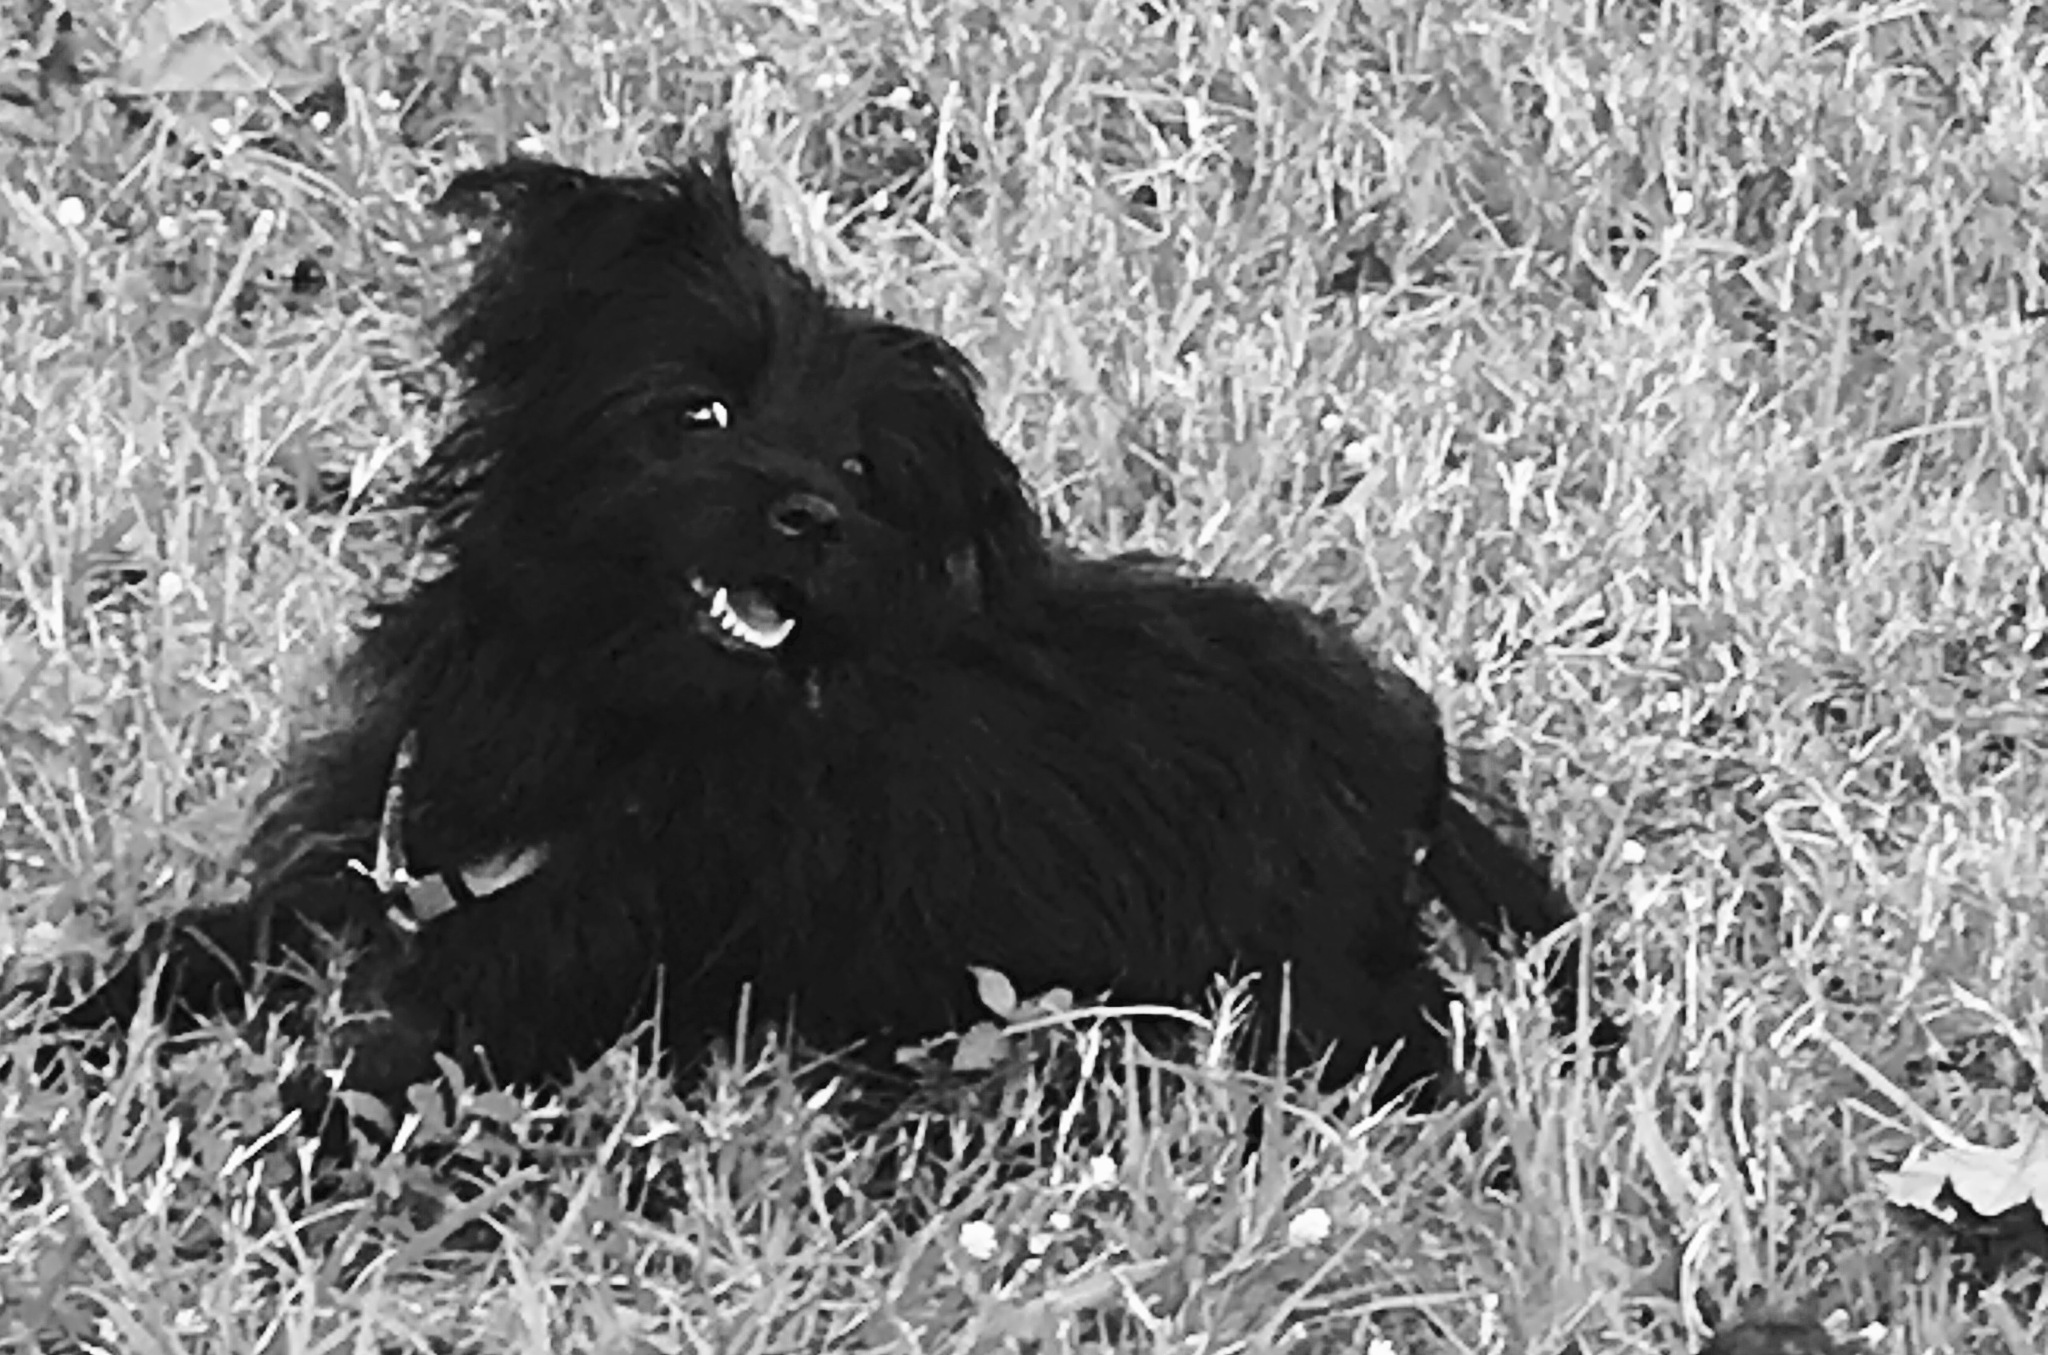 Sooty doggo  by sstokes3